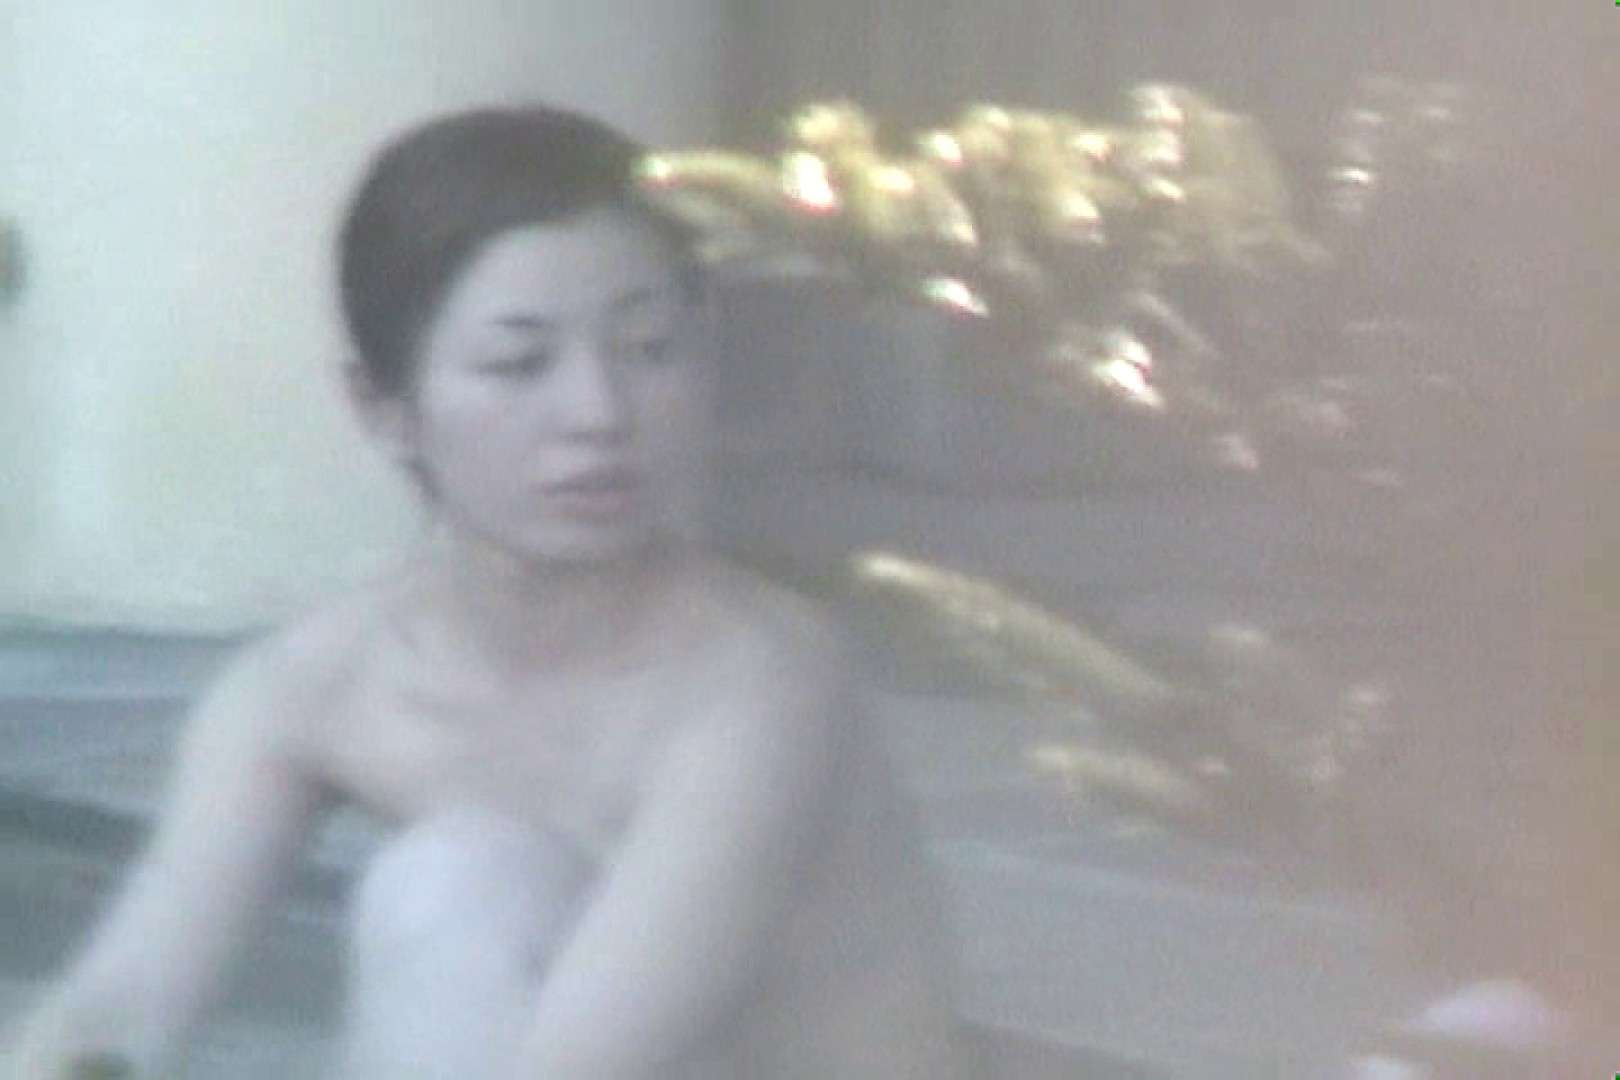 Aquaな露天風呂Vol.559 盗撮シリーズ   露天風呂編  101PIX 13